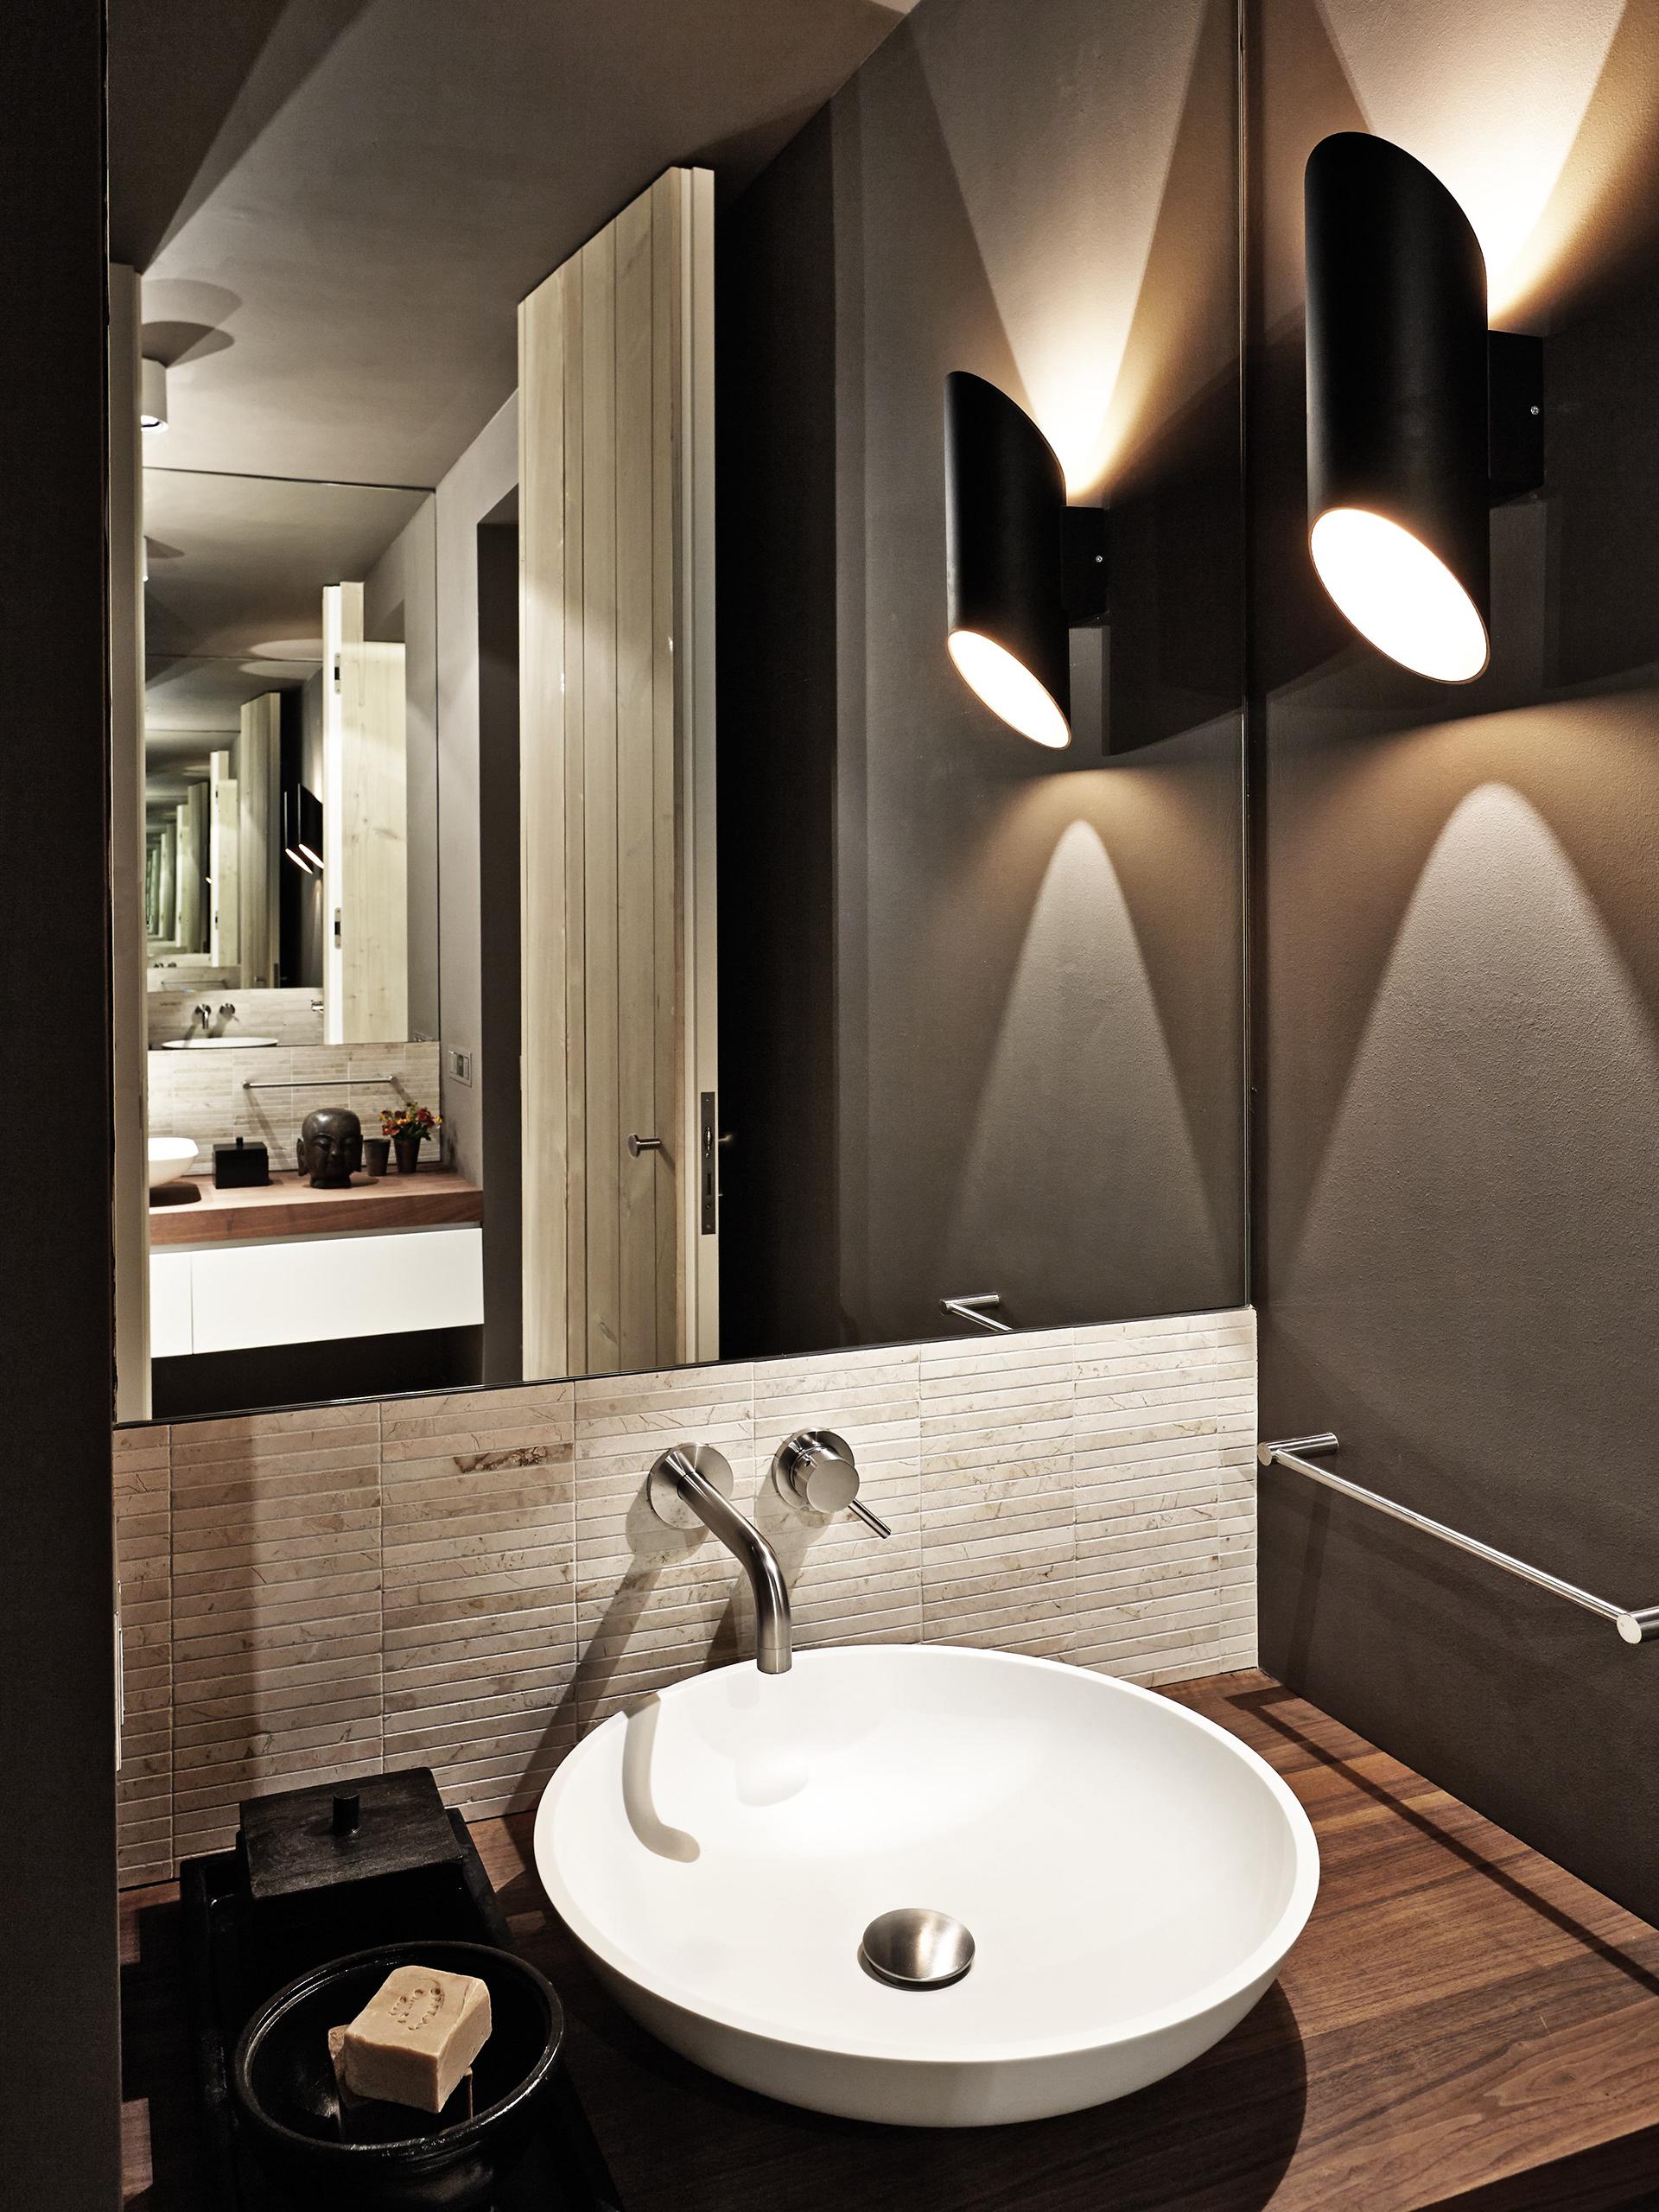 Annabell kutucu private apartment berlin - Decoracion de apartamentos modernos ...